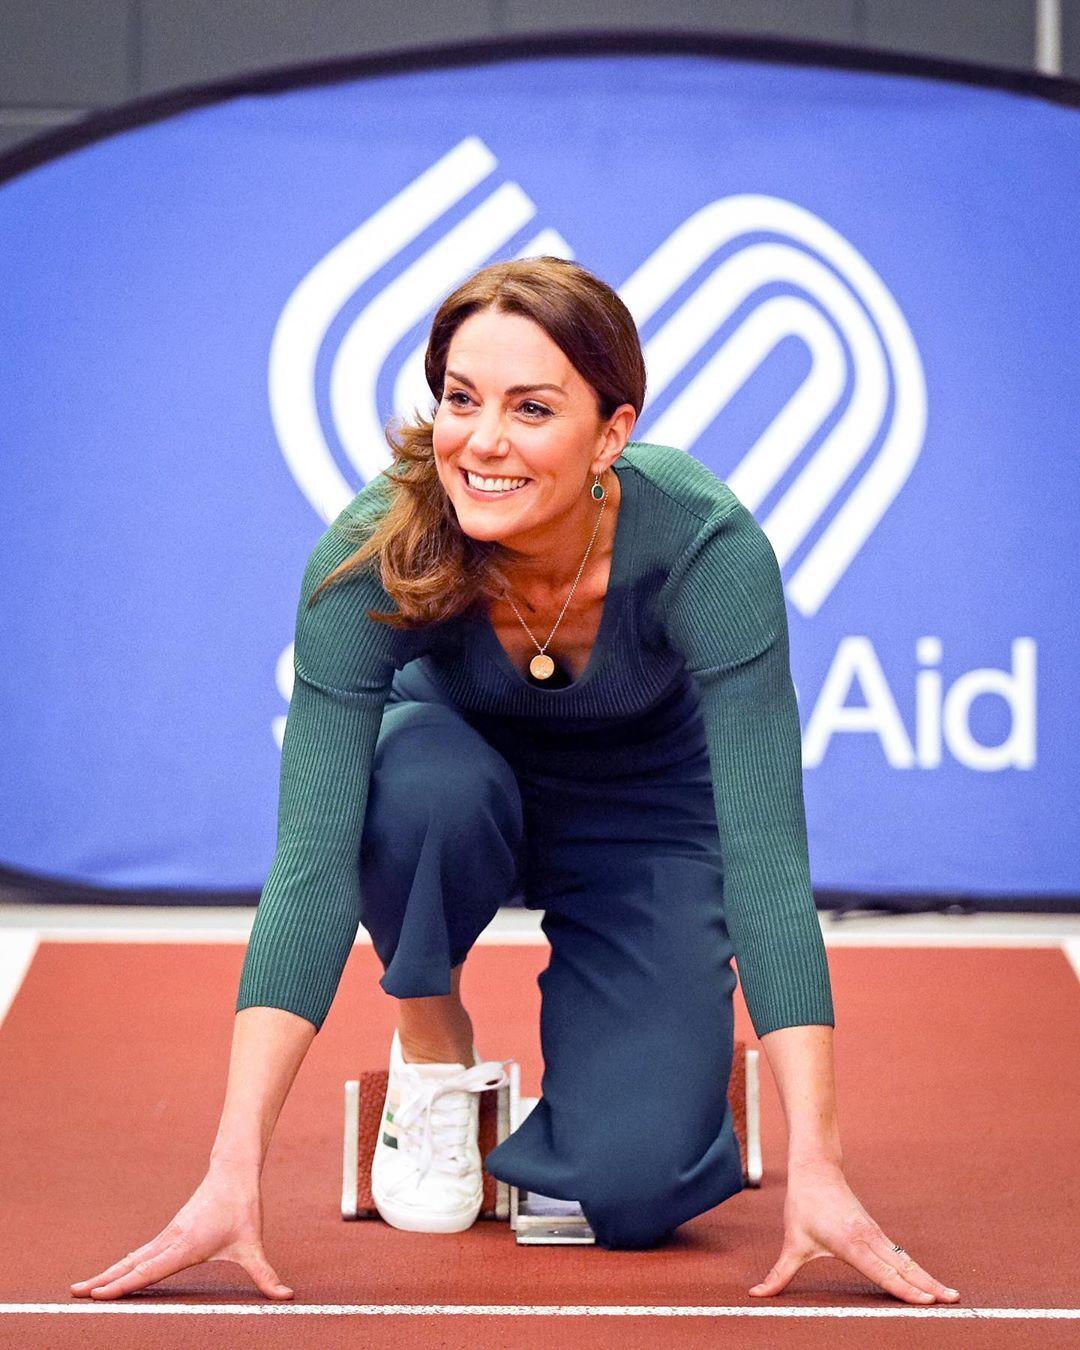 Kate Middleton trong một sự kiện thể thao. Ảnh: MC